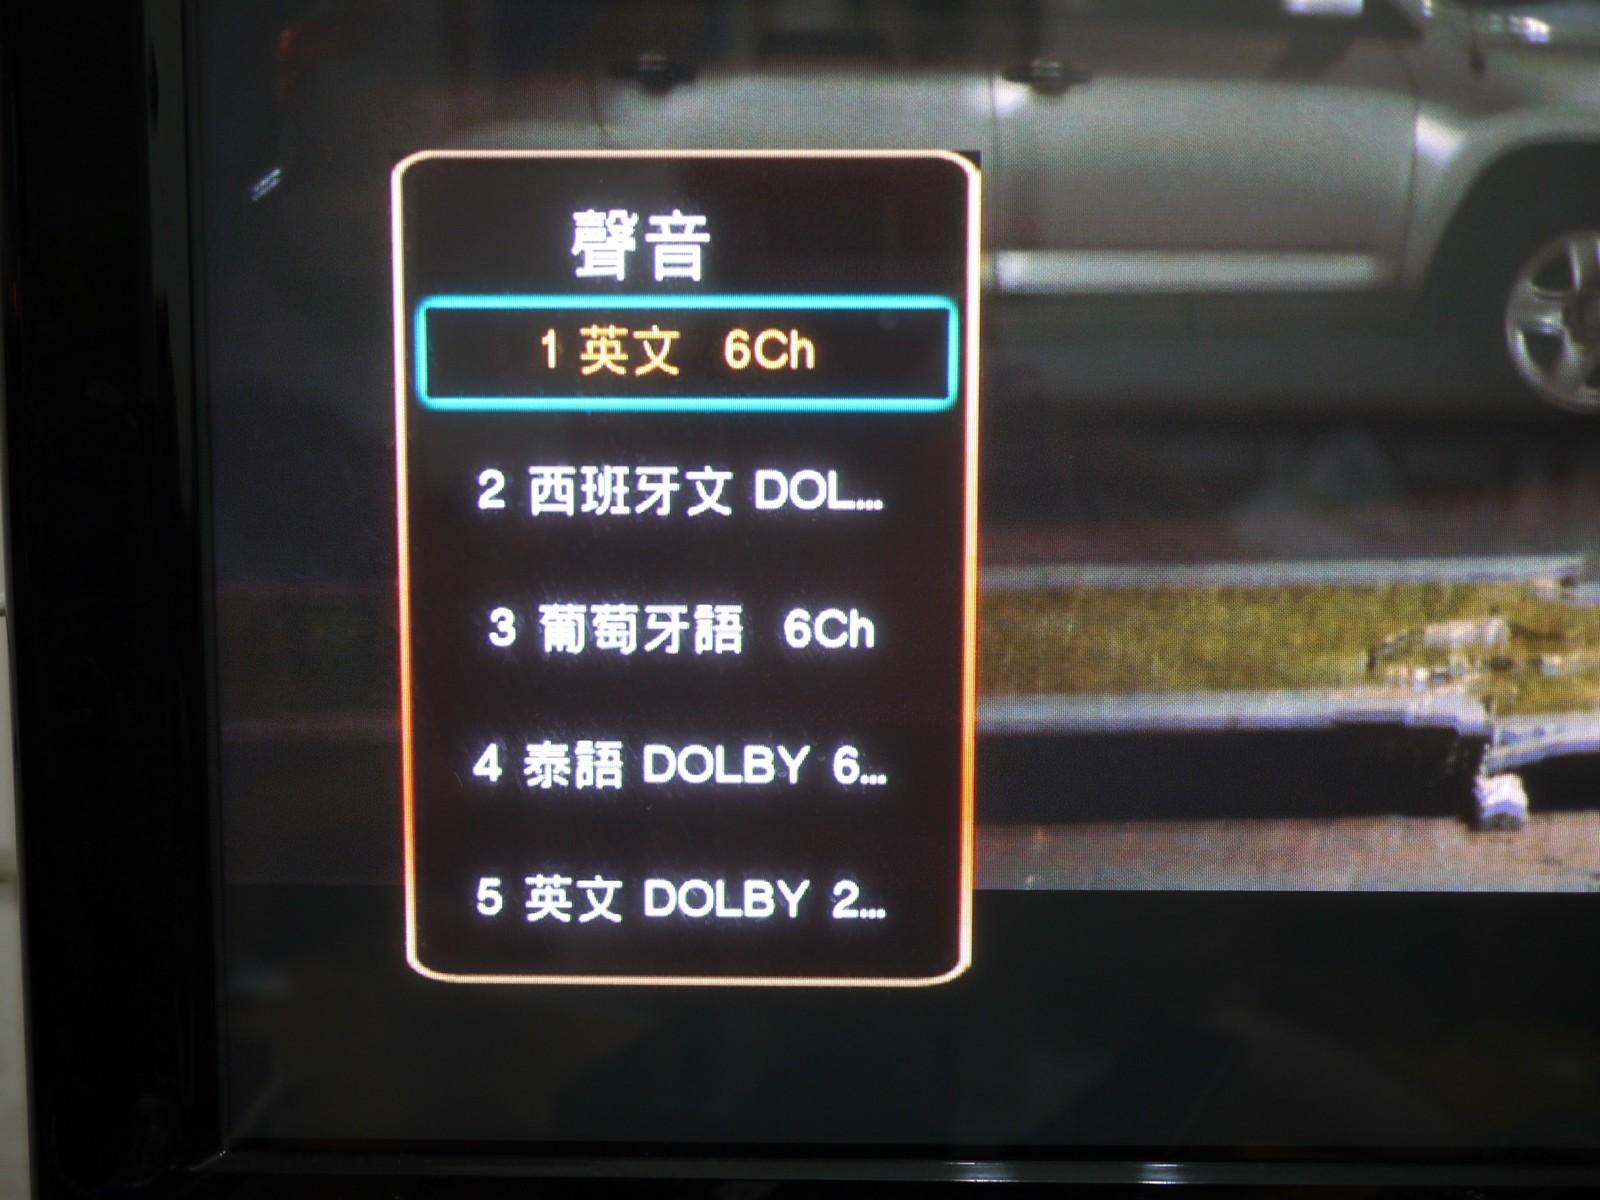 P1050710.JPG